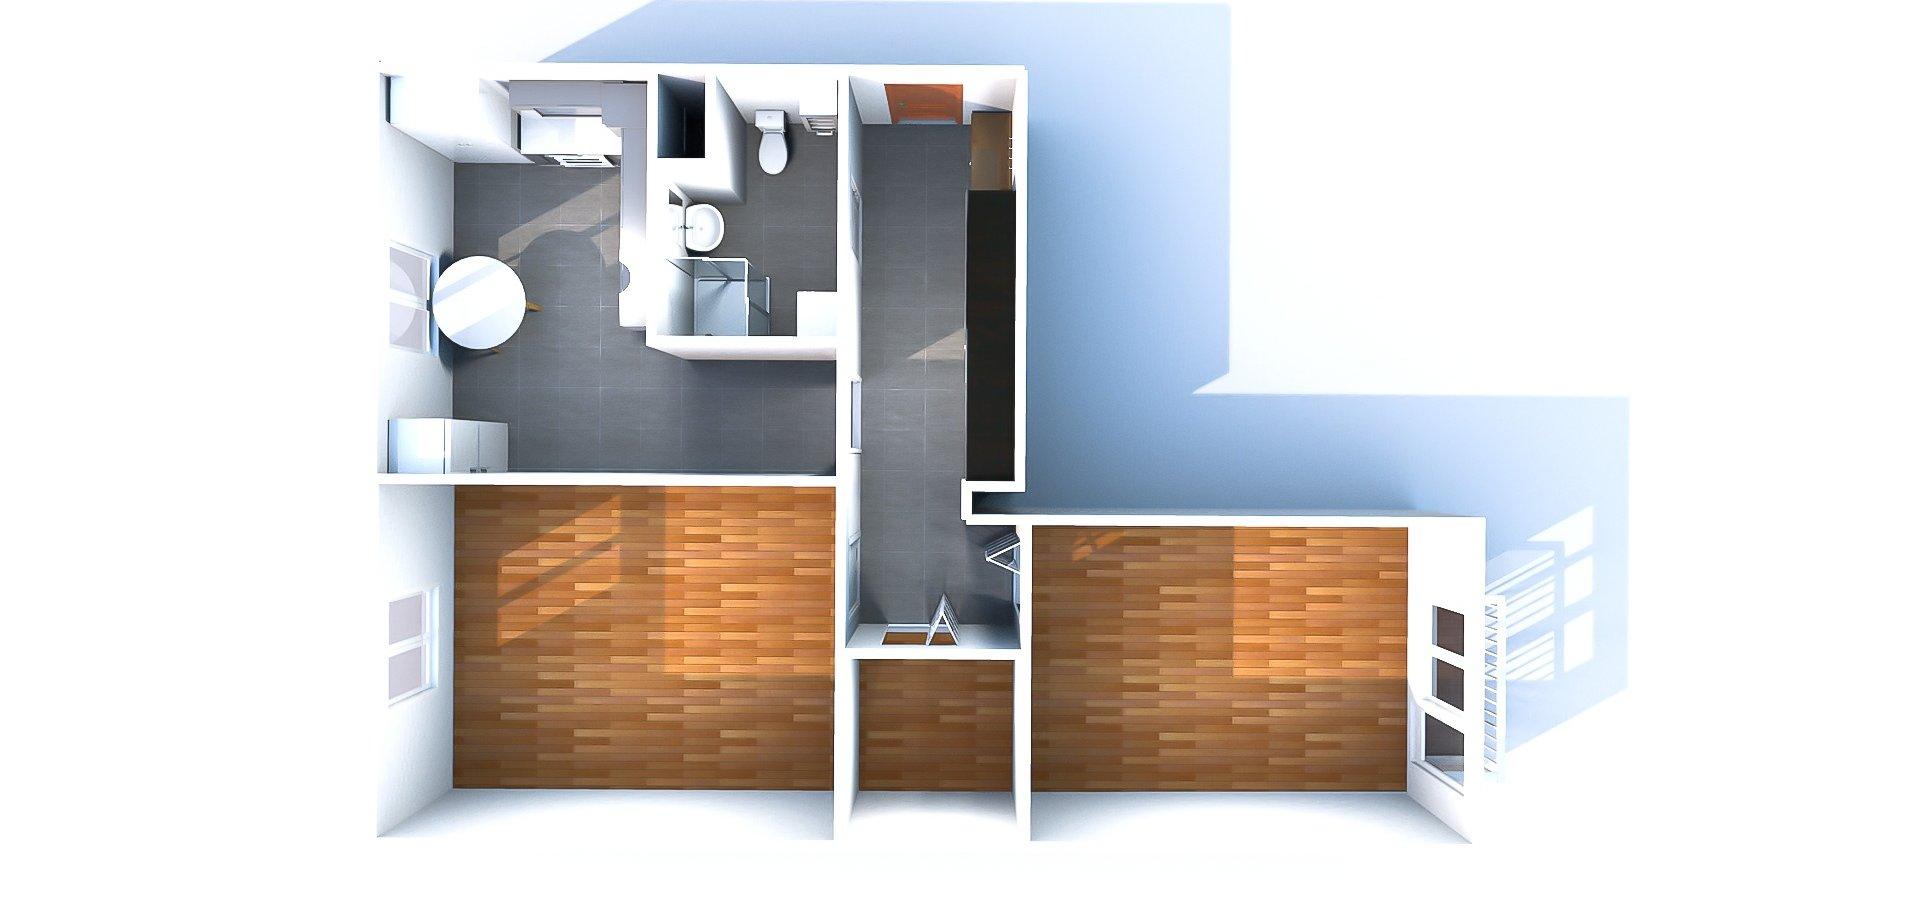 Pronájem bytu 2+1, 52 m2 + balkón